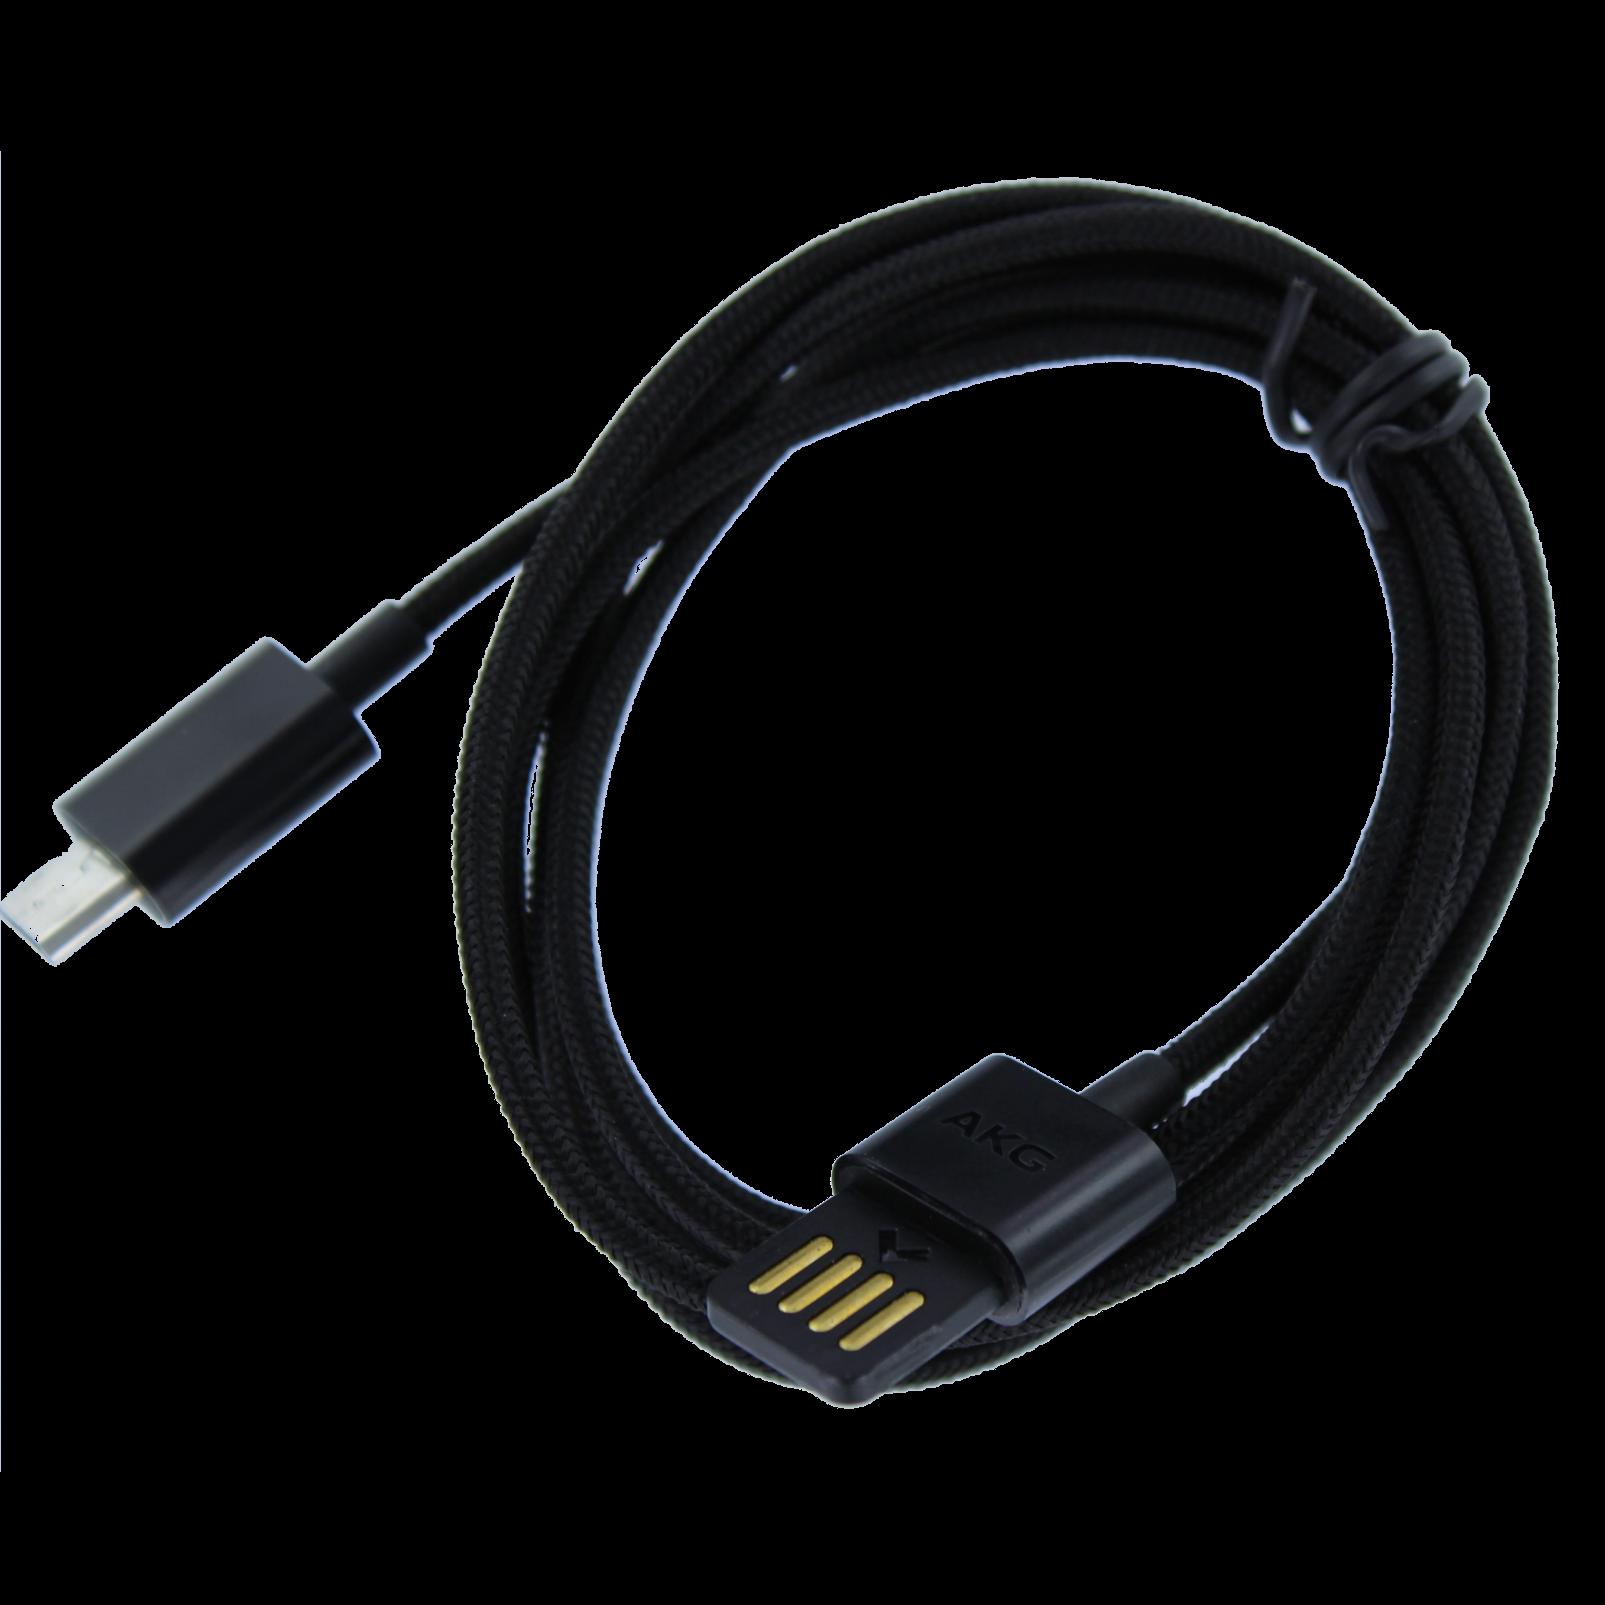 USB Charging cable, 120cm, AKG N90